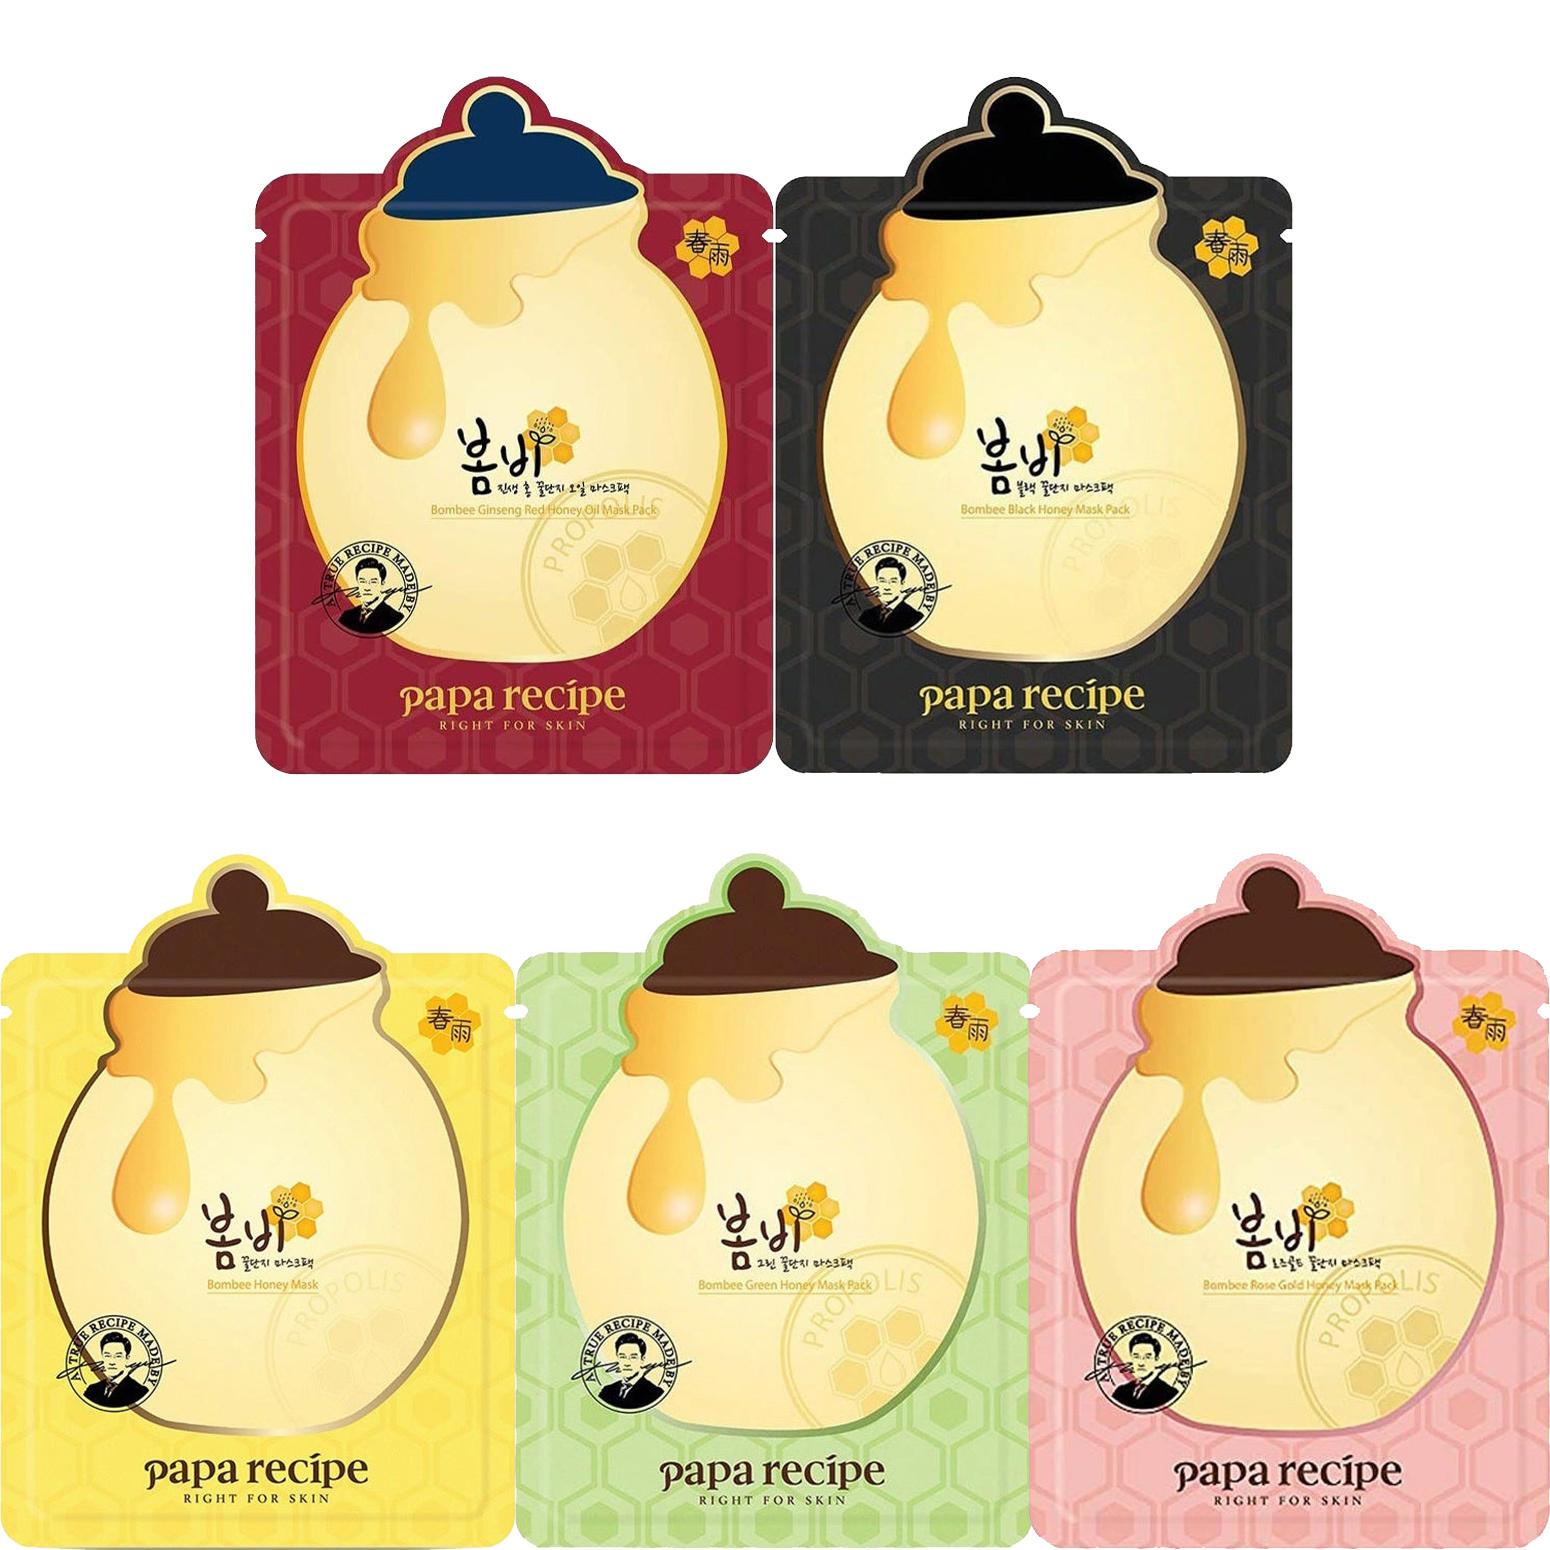 Bombee Honey Mask Probierset (5 Stk)-1